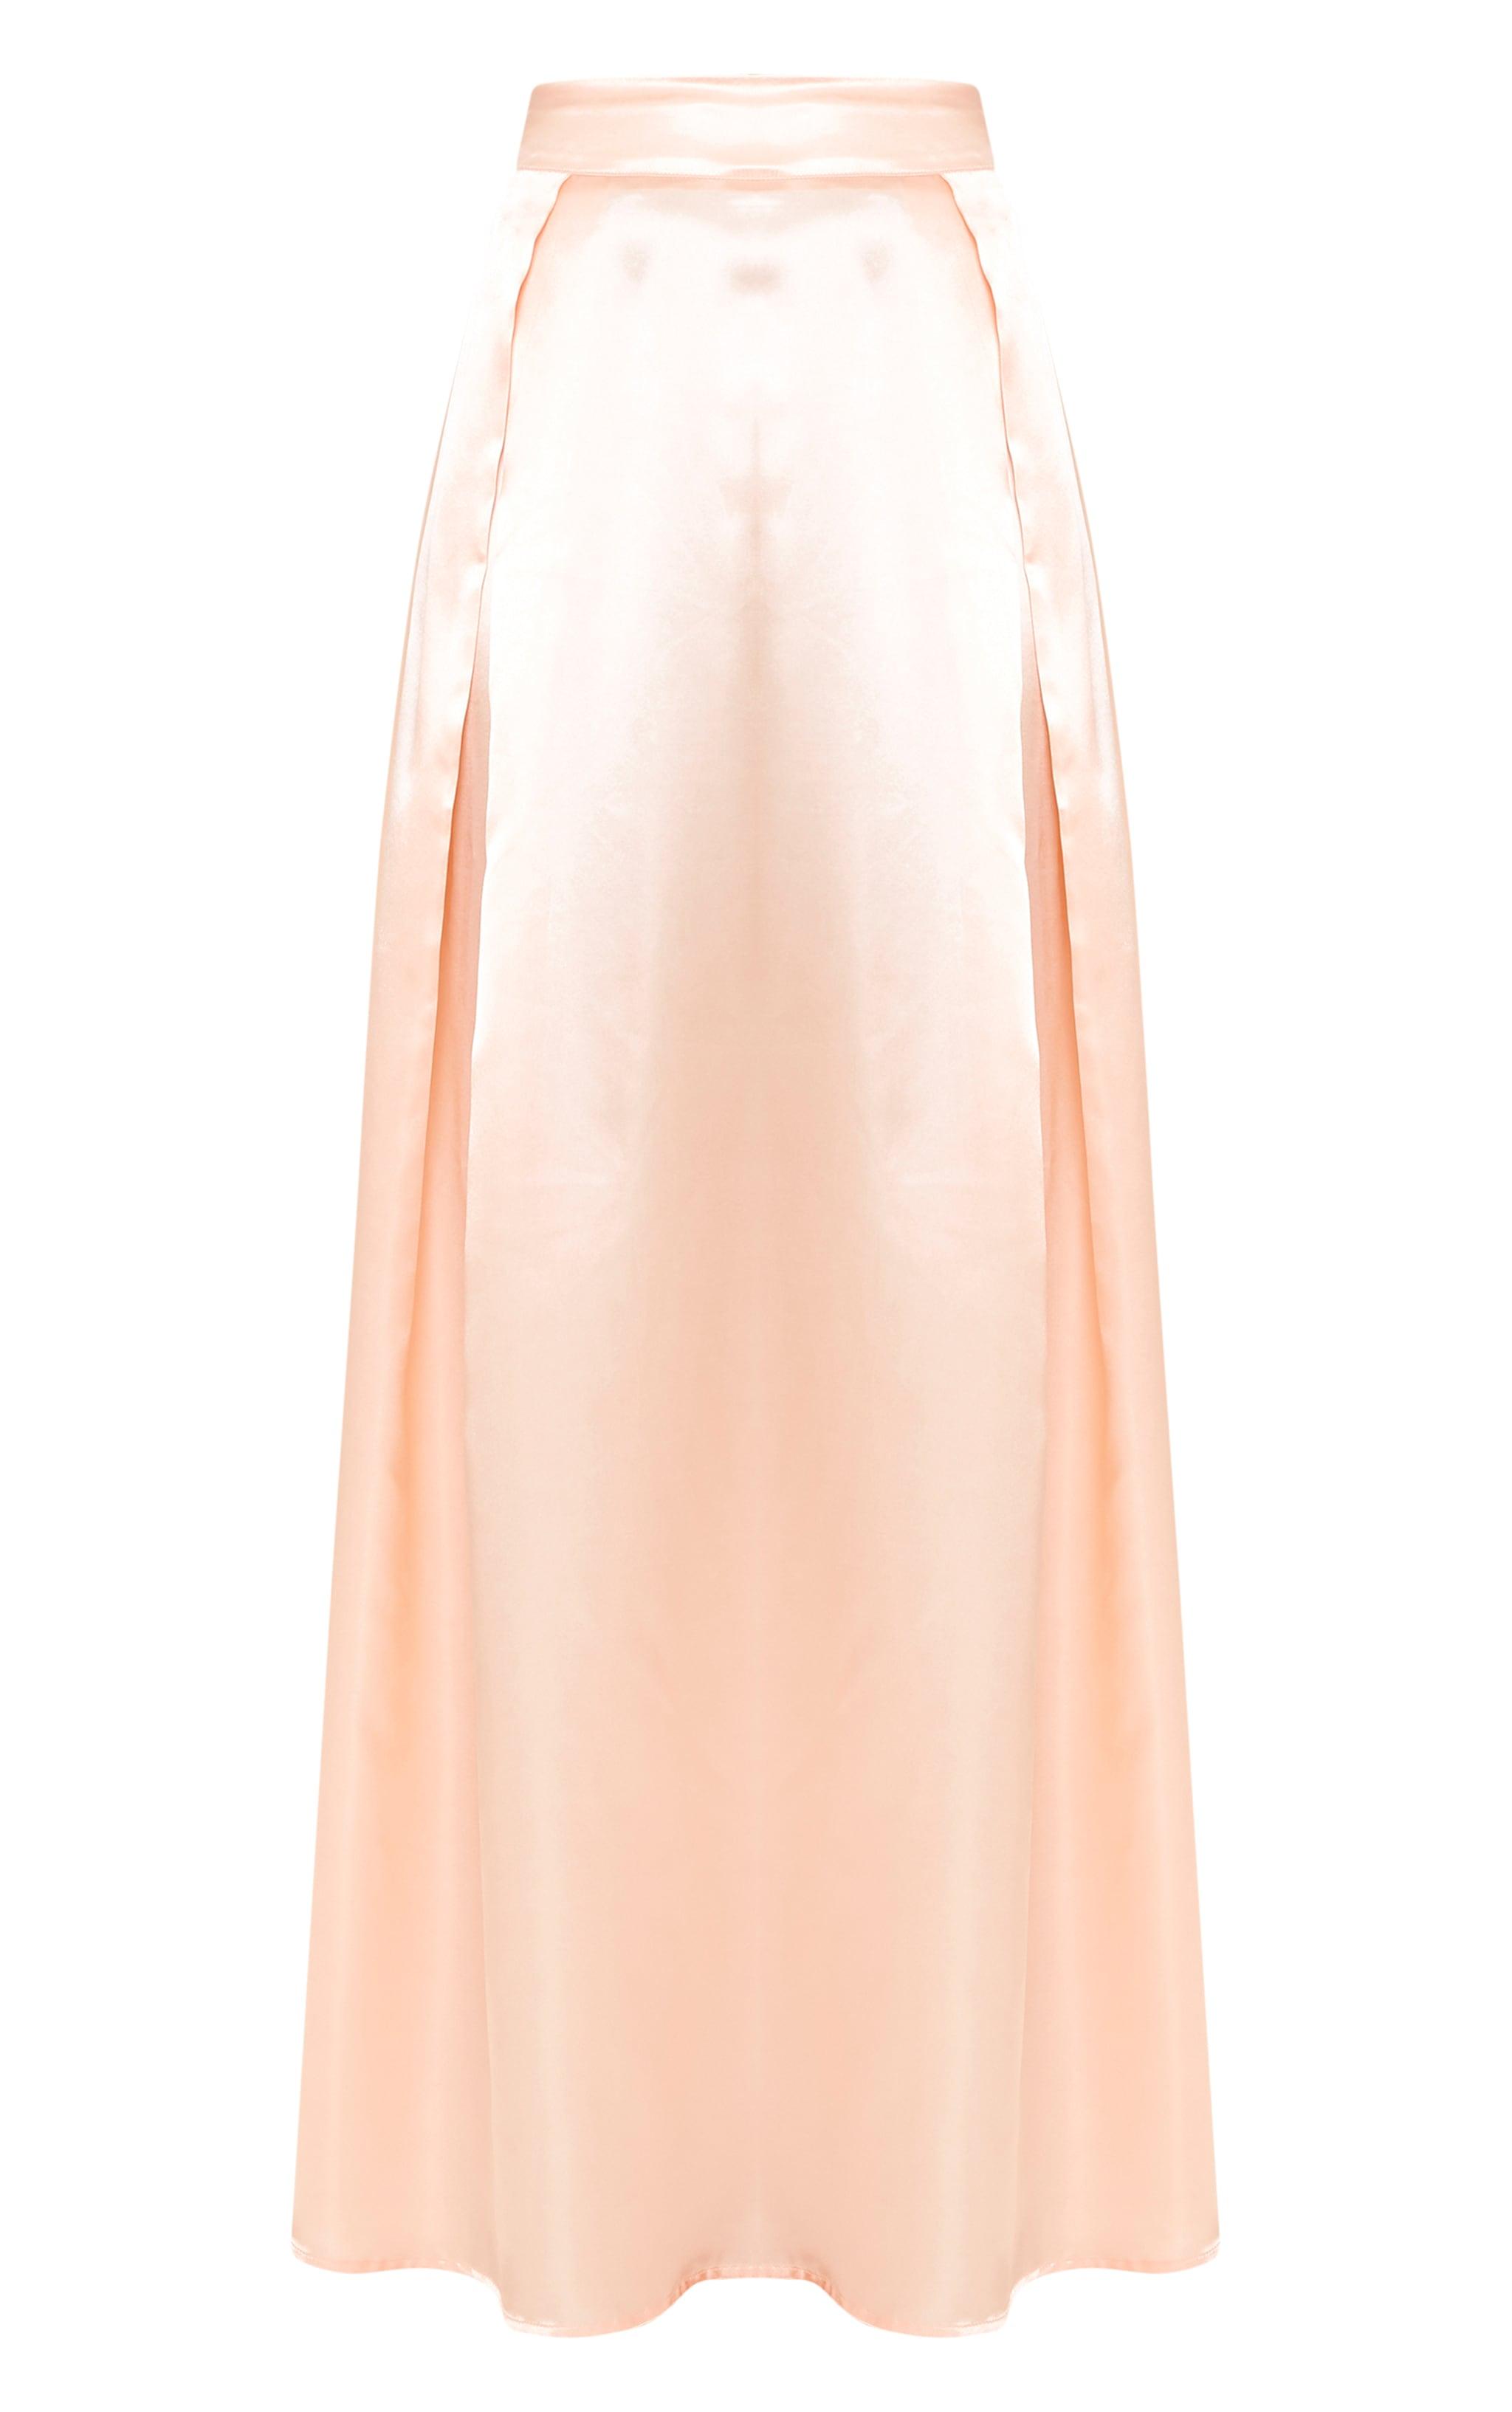 Ruthie Light Peach  Satin Maxi Prom Skirt  3